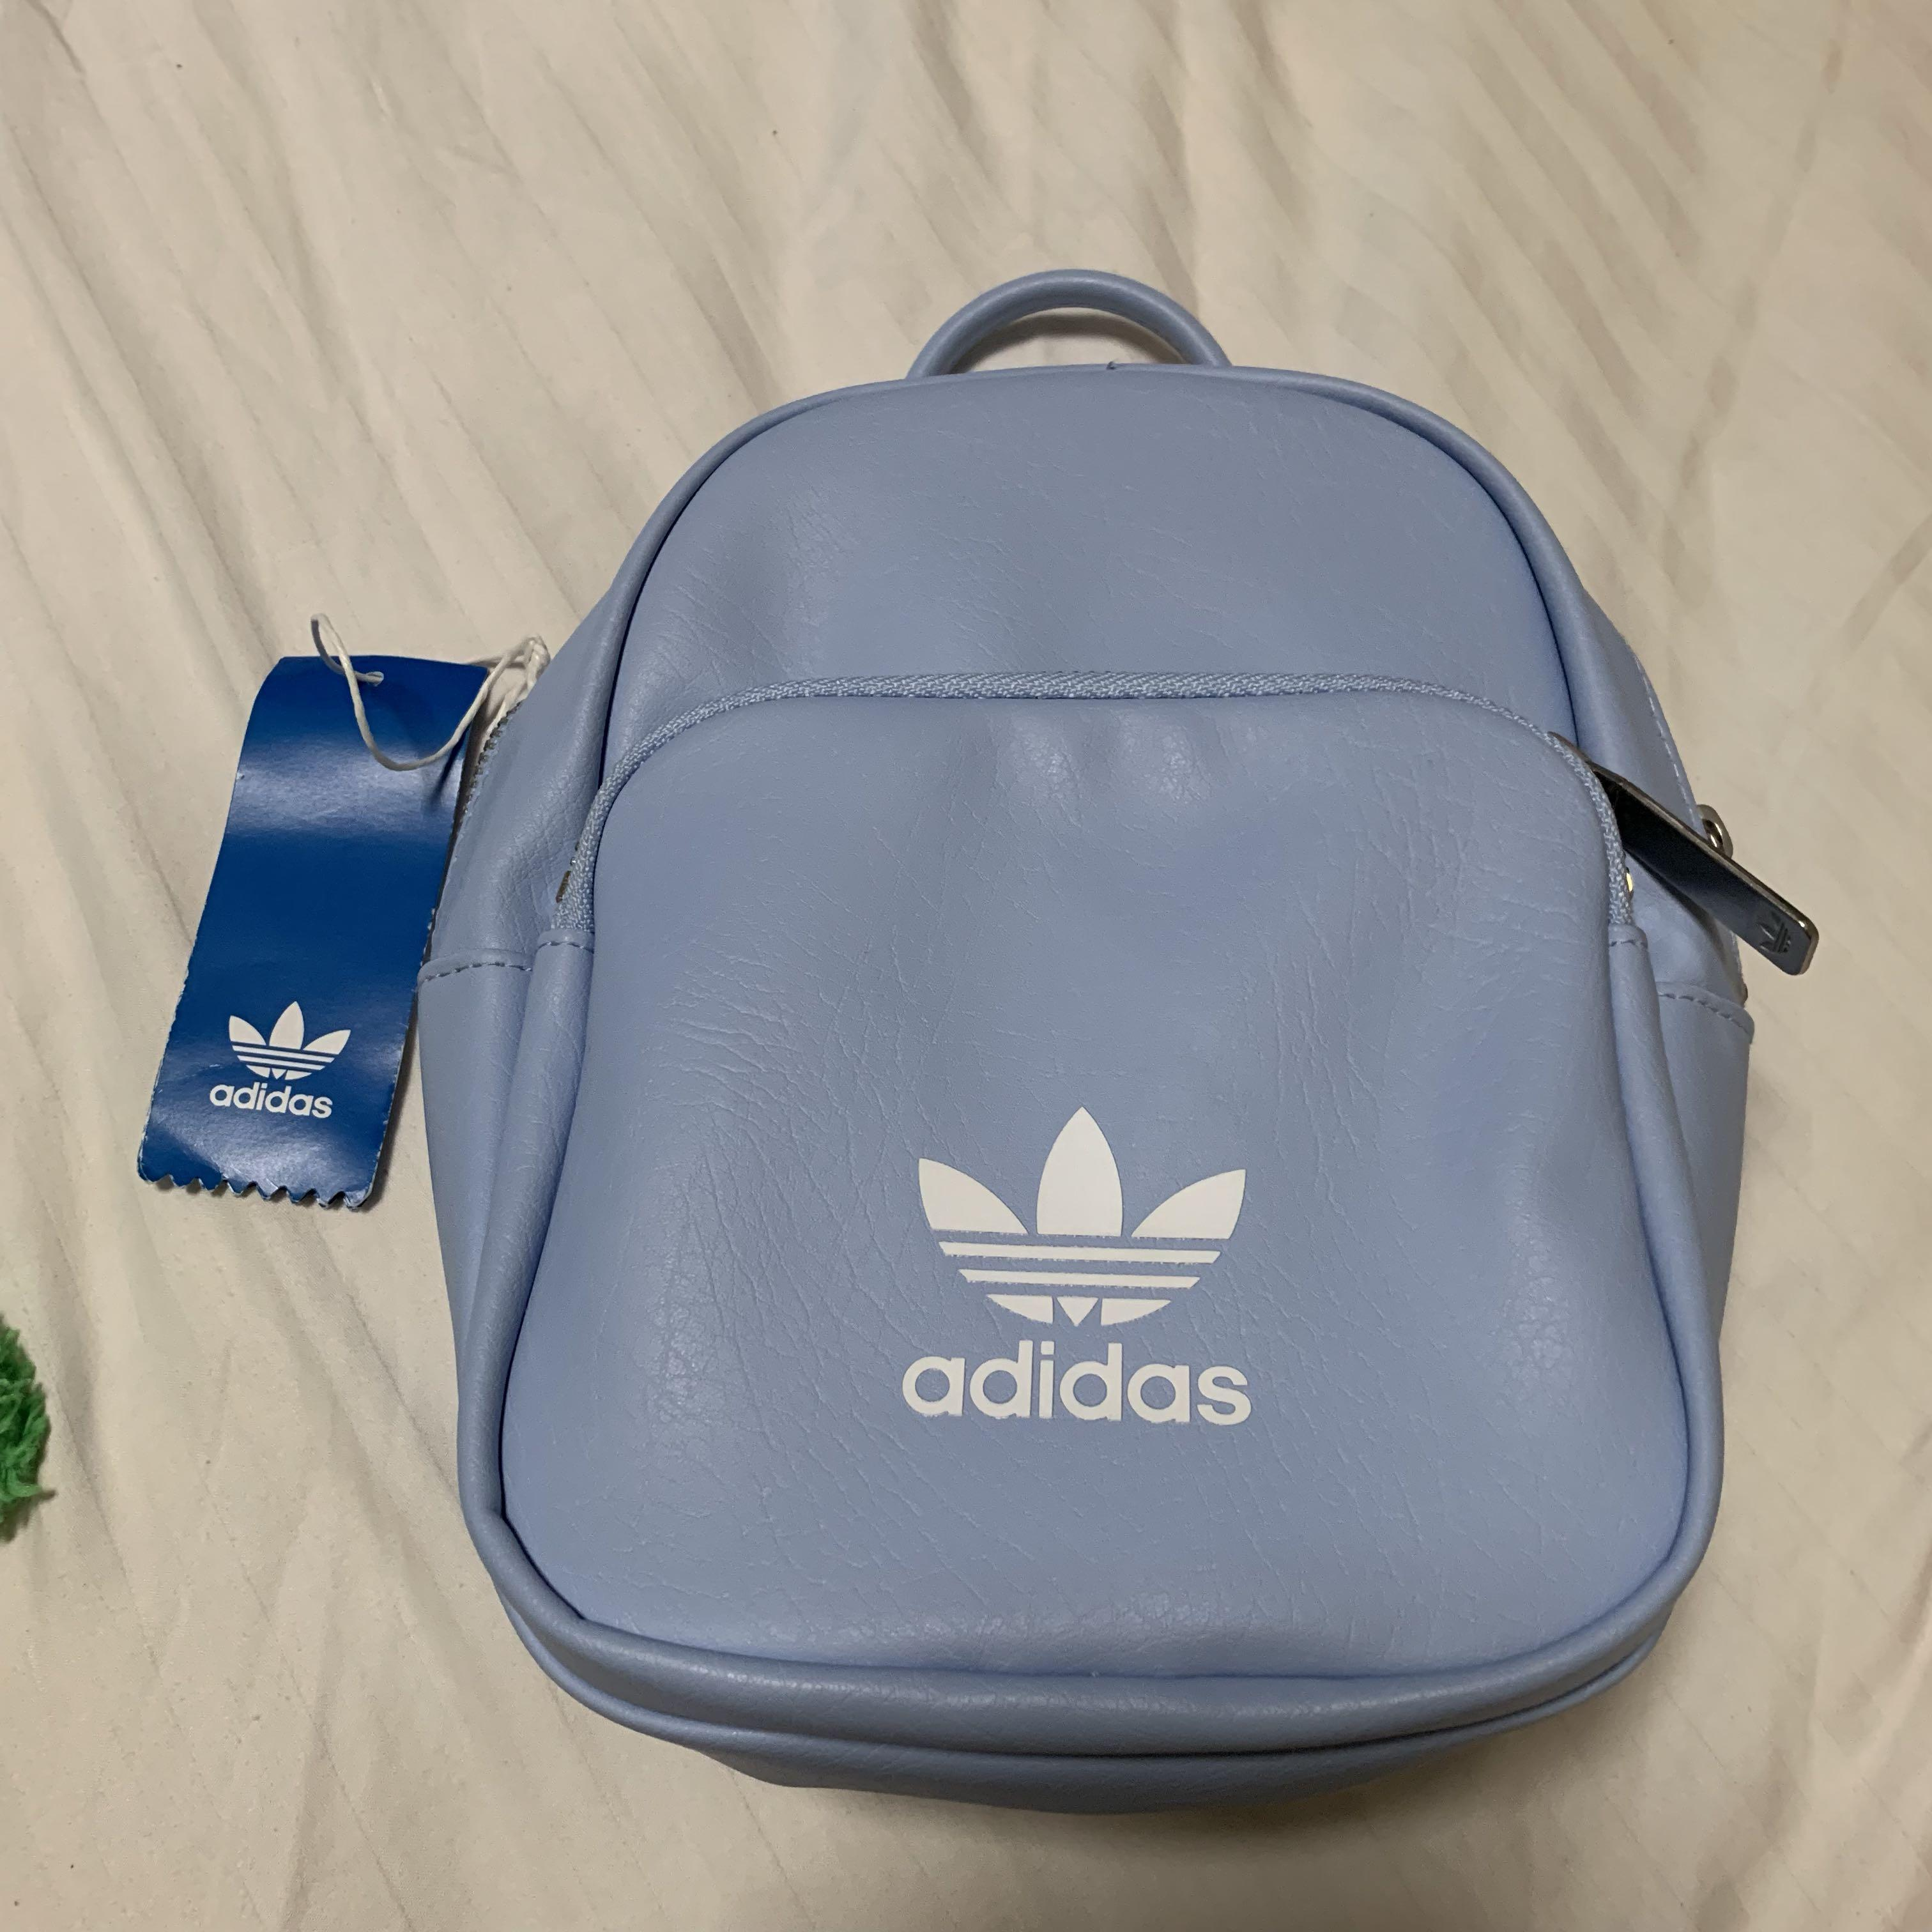 41f472a3ed6 Adidas Original CLASSIC MINI BACKPACK, Women's Fashion, Bags ...